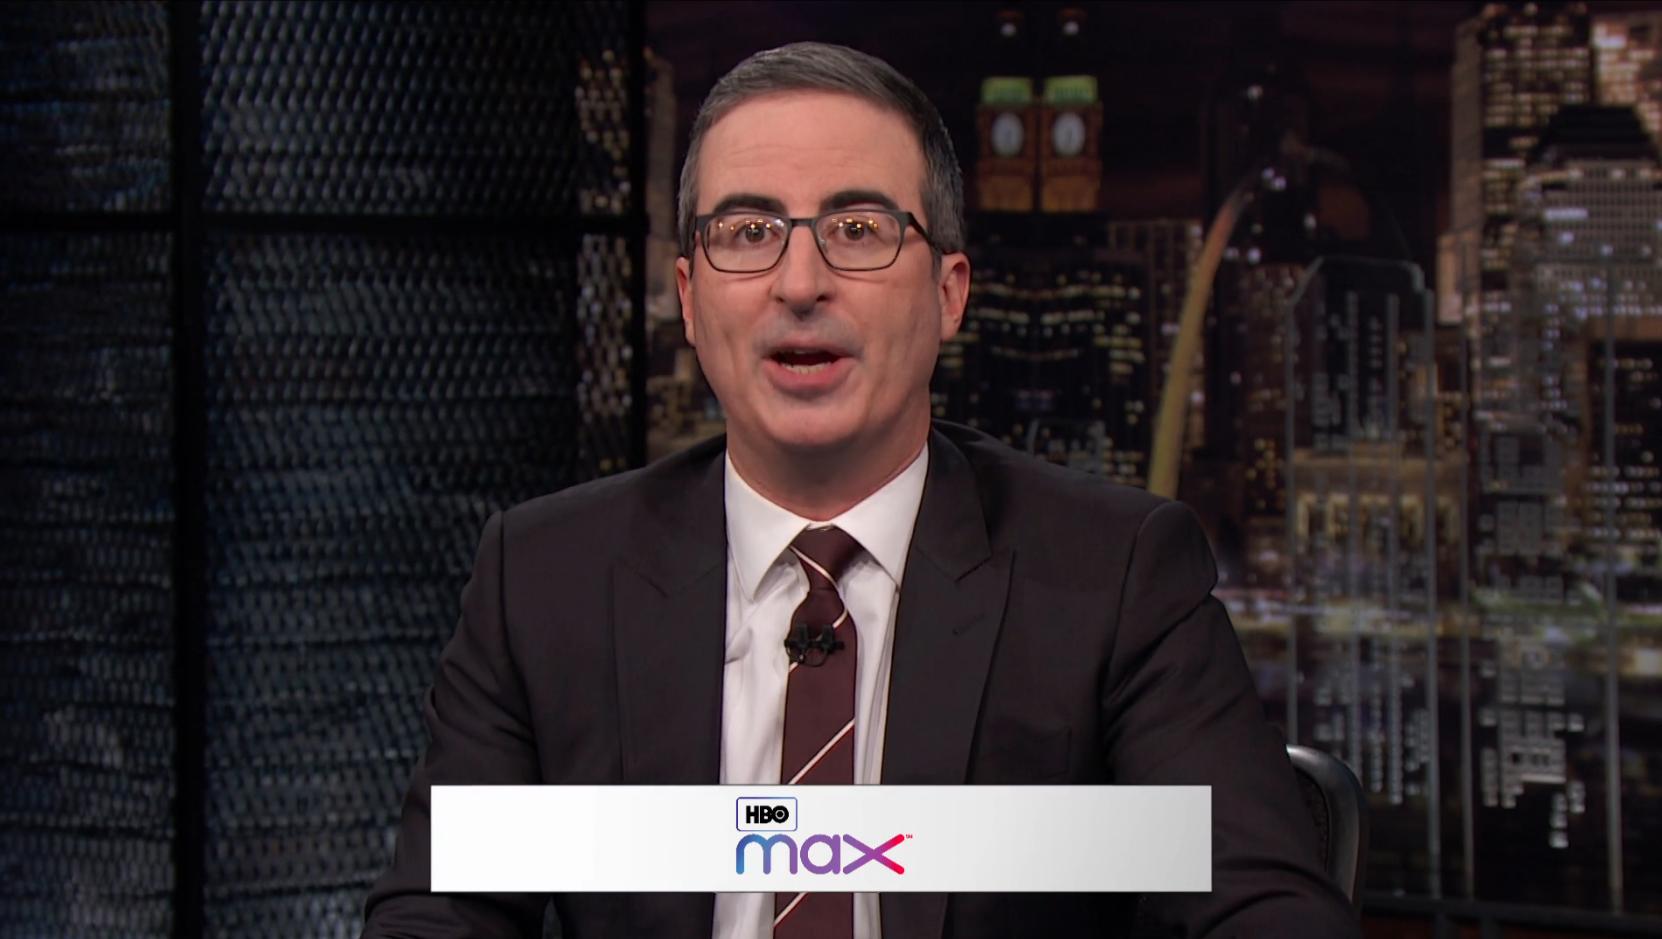 HBO's John Oliver Slams New Streamer HBO Max: 'It's Not HBO, It's Just TV'